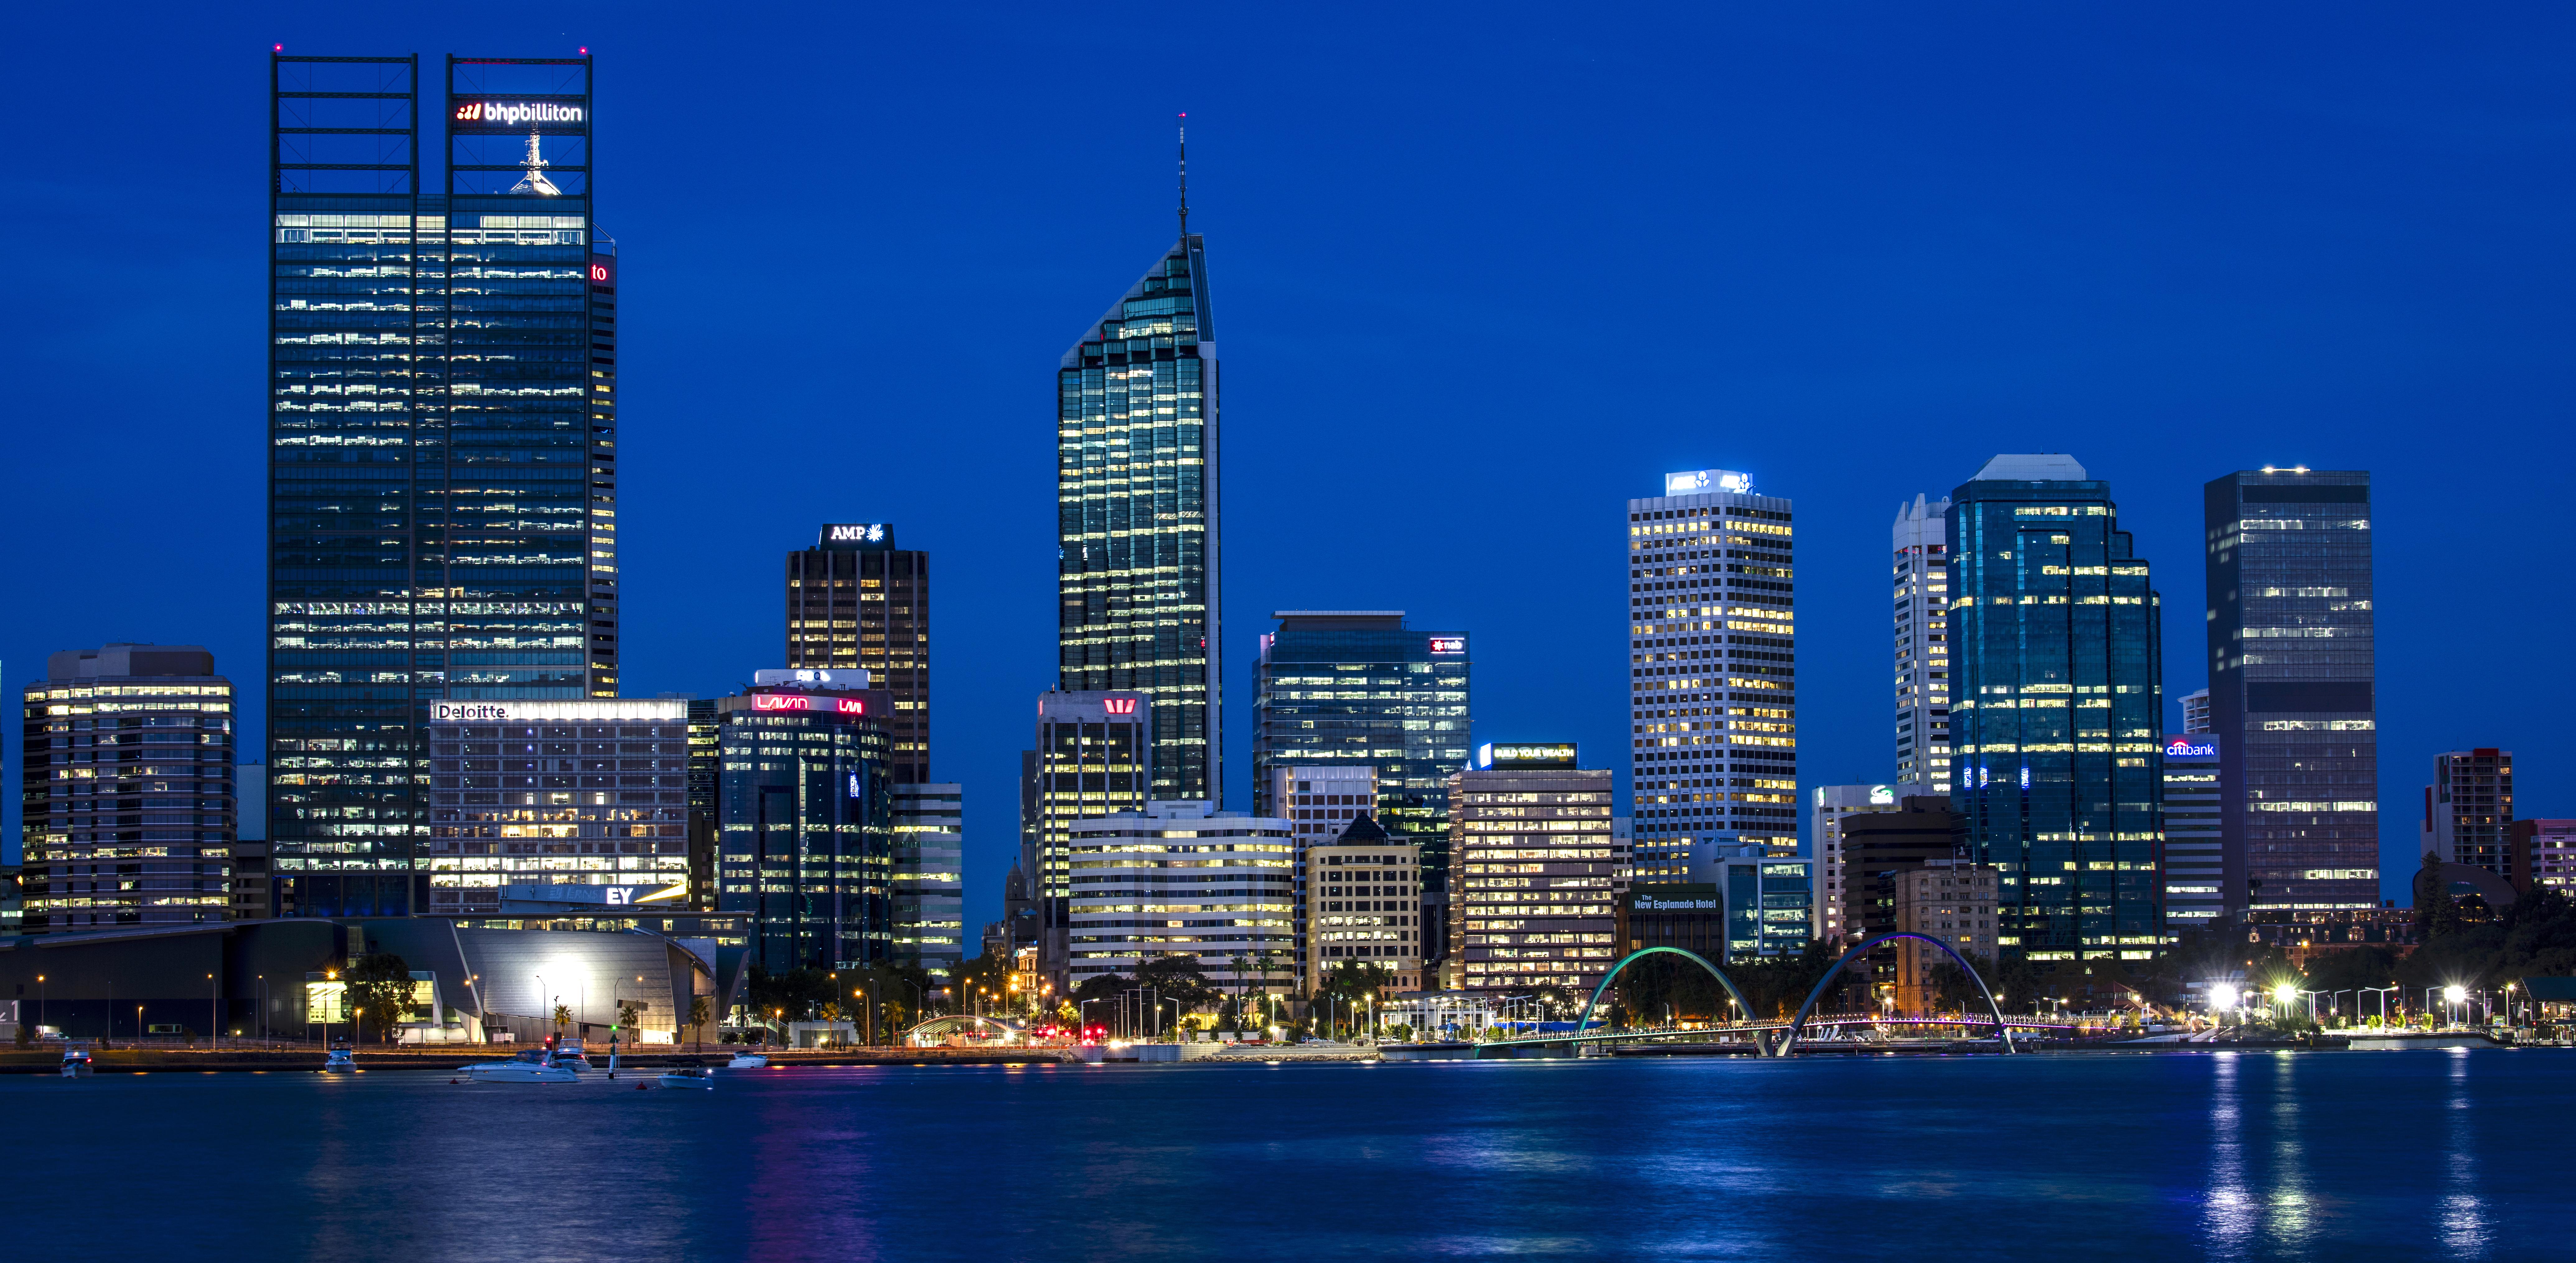 Tourism in Perth - Wikipedia